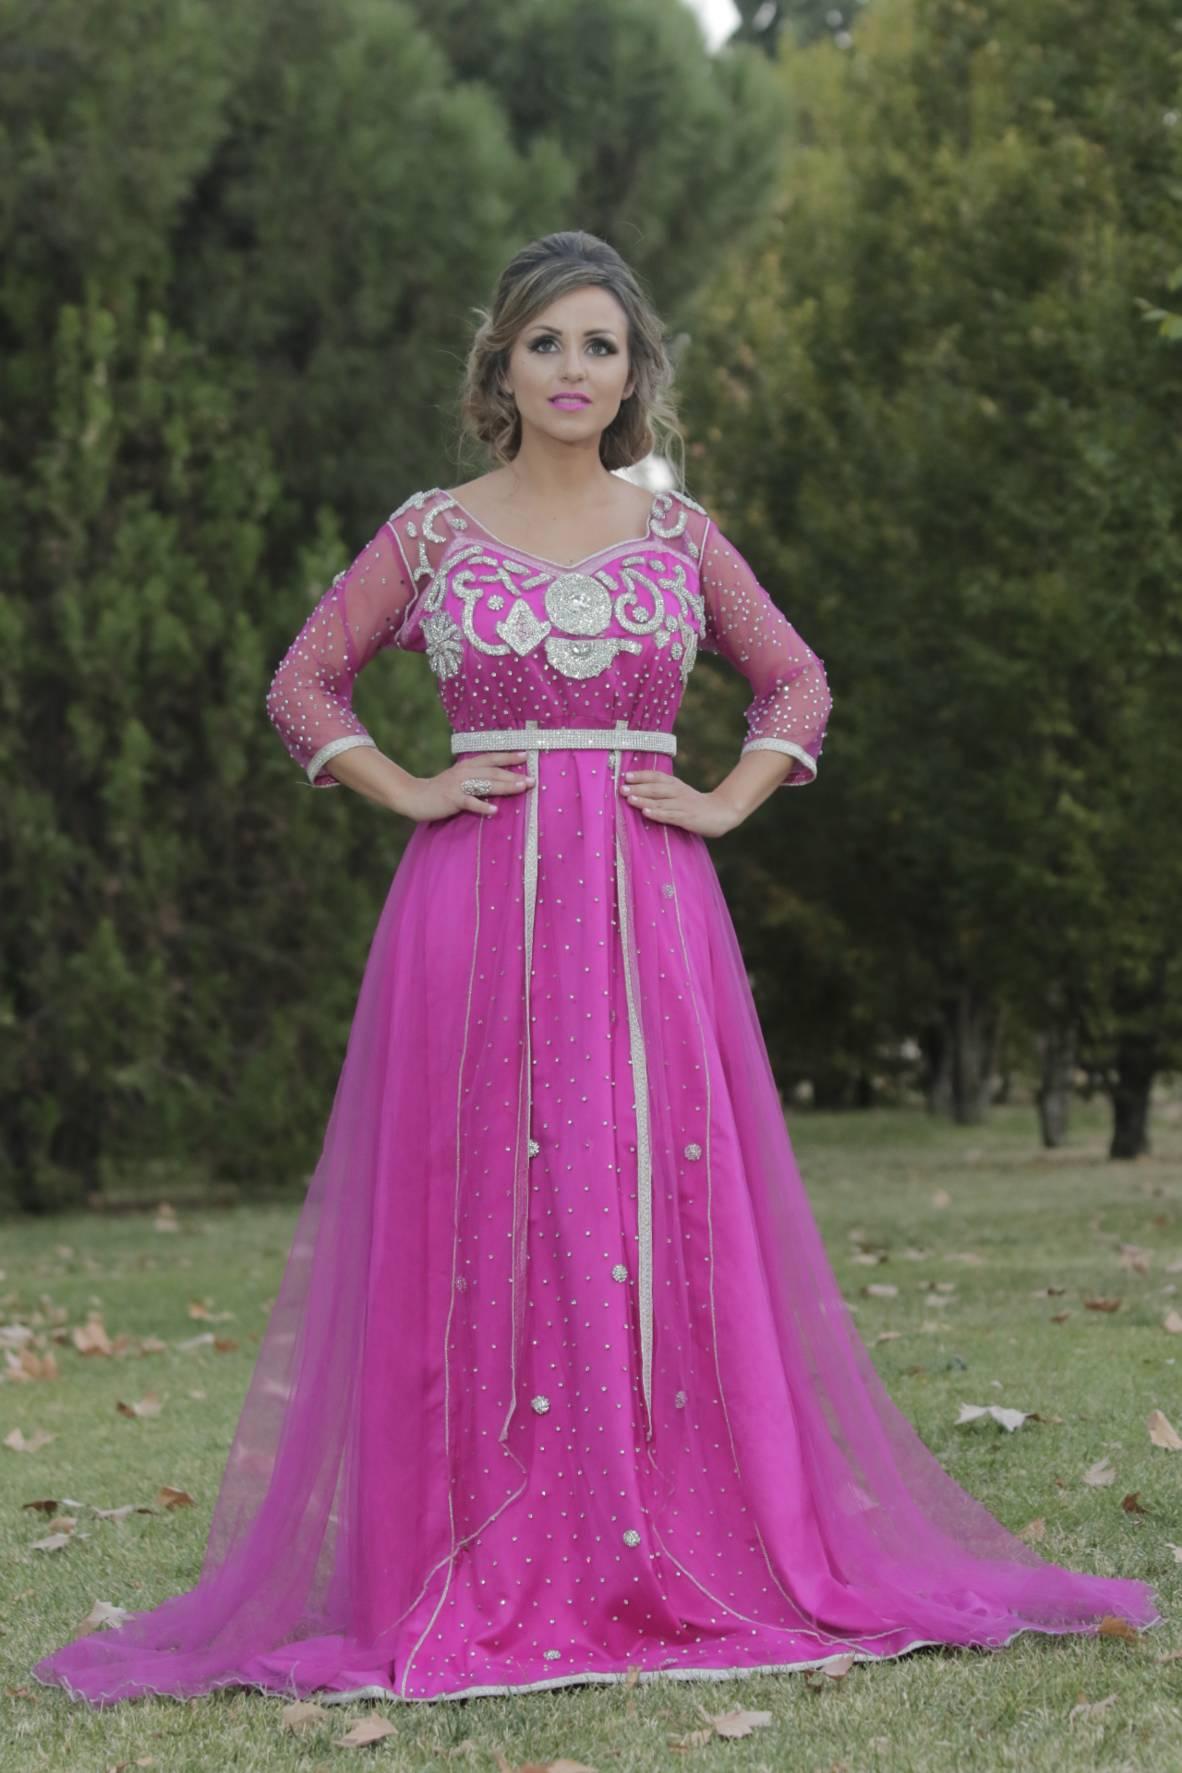 Encantador Vestido De Novia De Alquiler Sacramento Patrón - Vestido ...